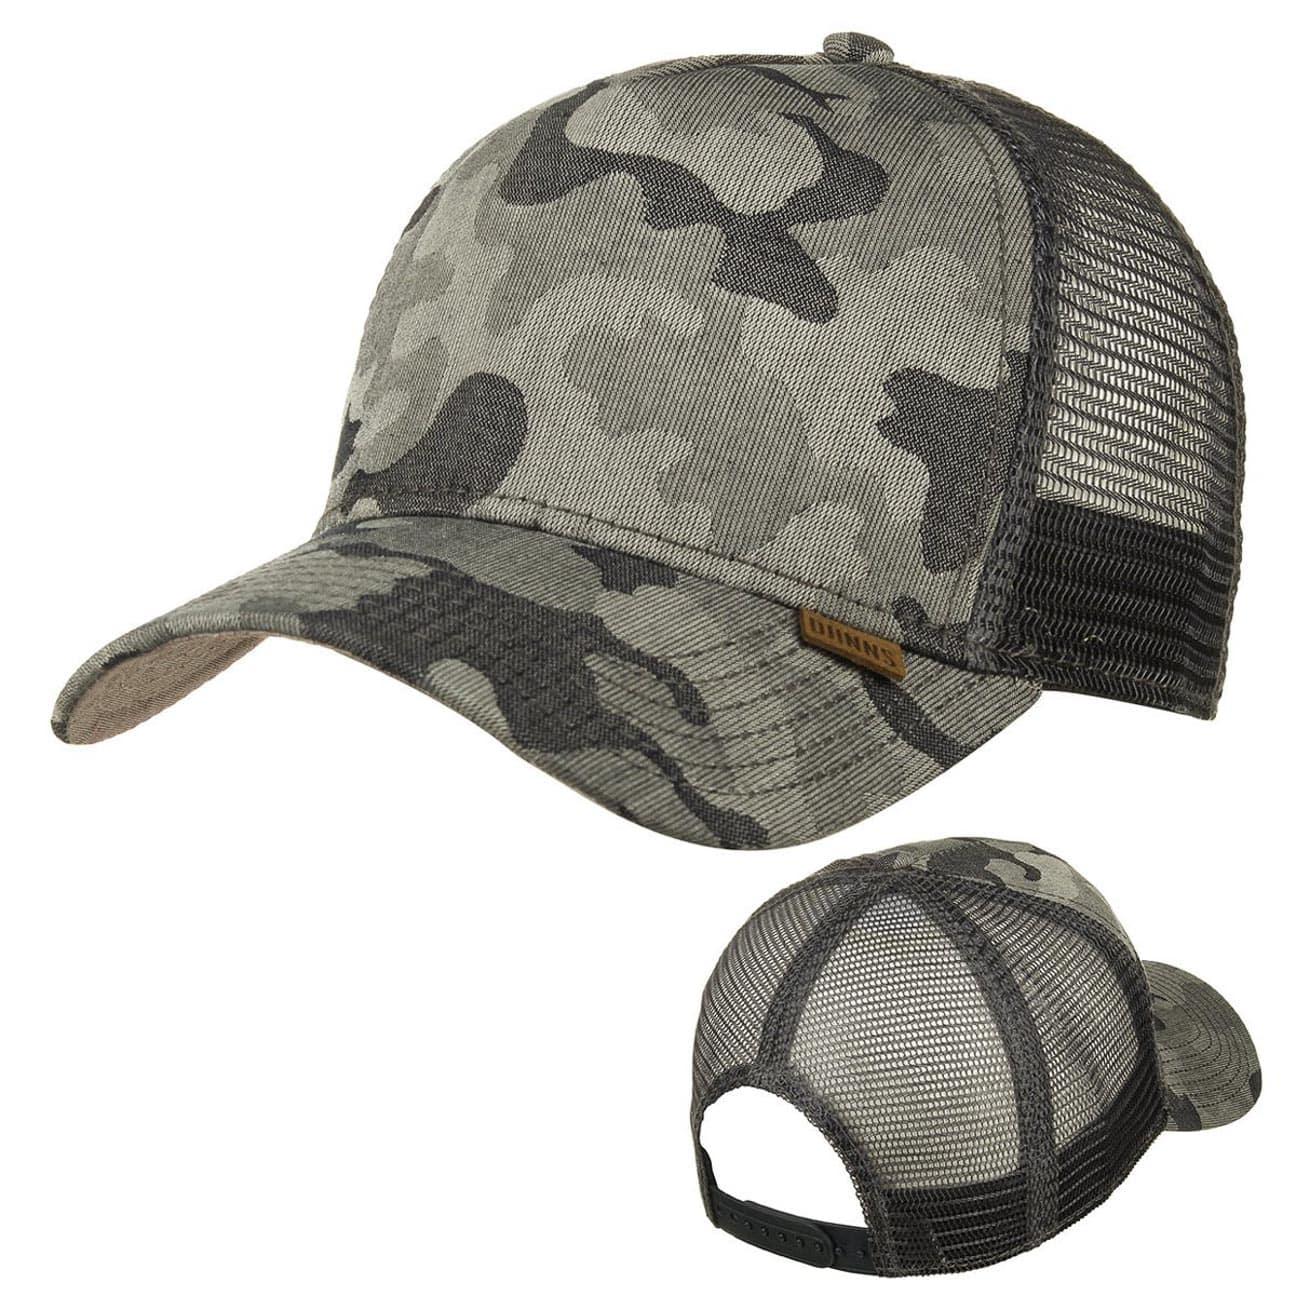 hft canvas camo trucker cap by djinns eur 21 99 hats. Black Bedroom Furniture Sets. Home Design Ideas